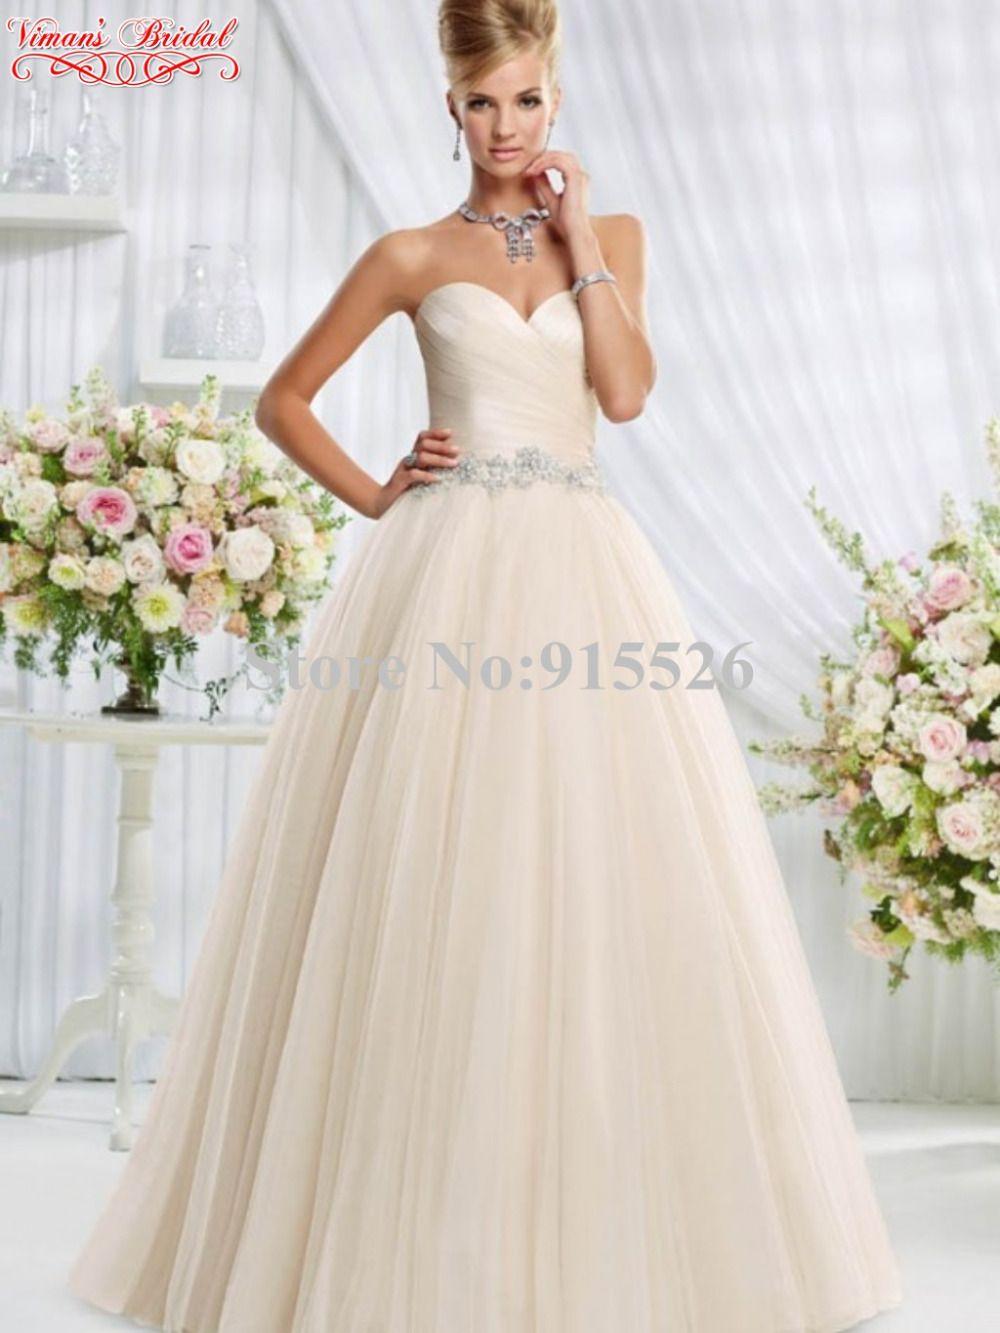 See through corset wedding dresses  Click to Buy ucuc Organza Princess Wedding Dress Pleat Sweetheart Off